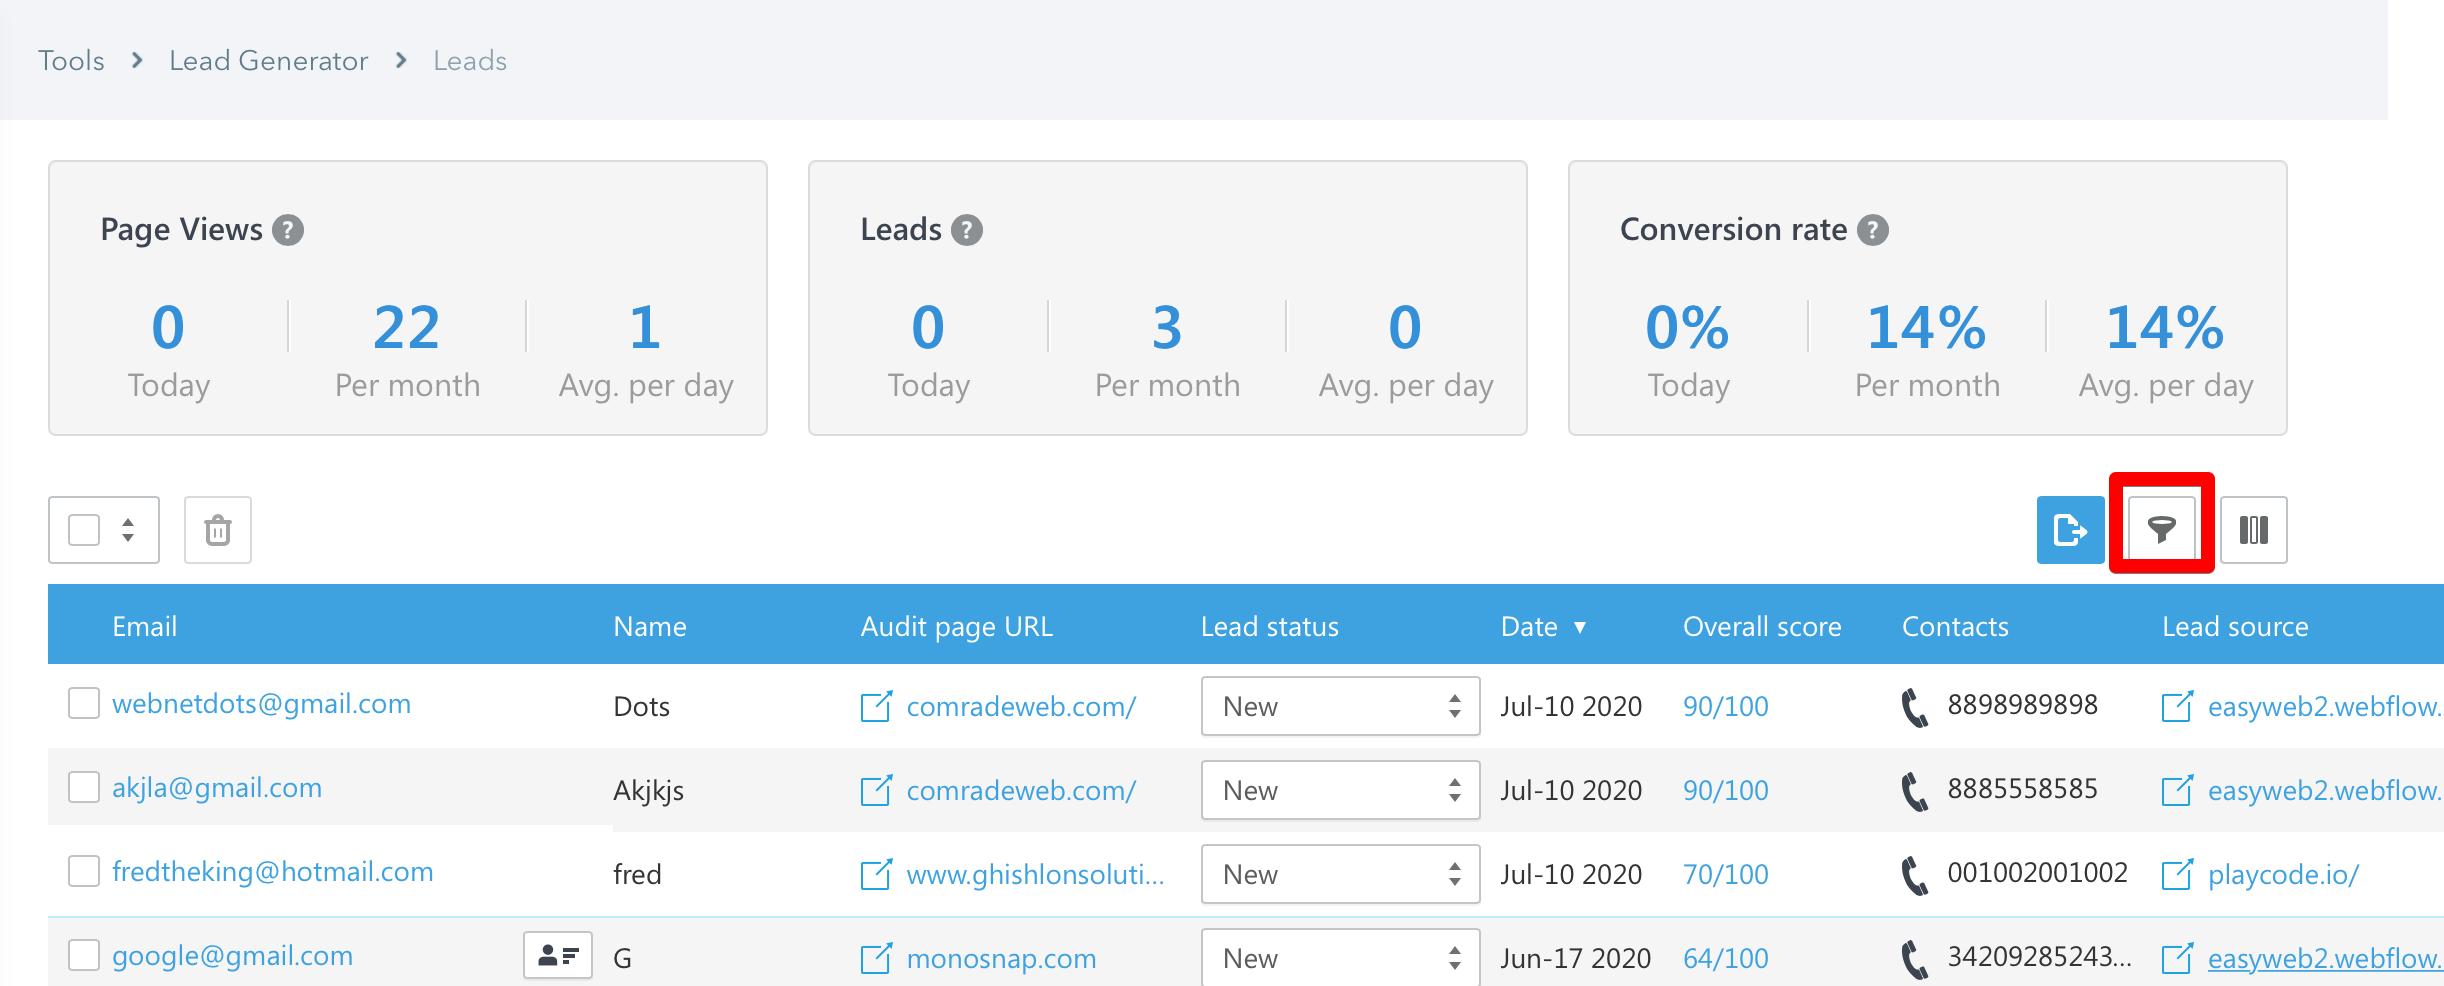 SE Ranking Lead Generator filter